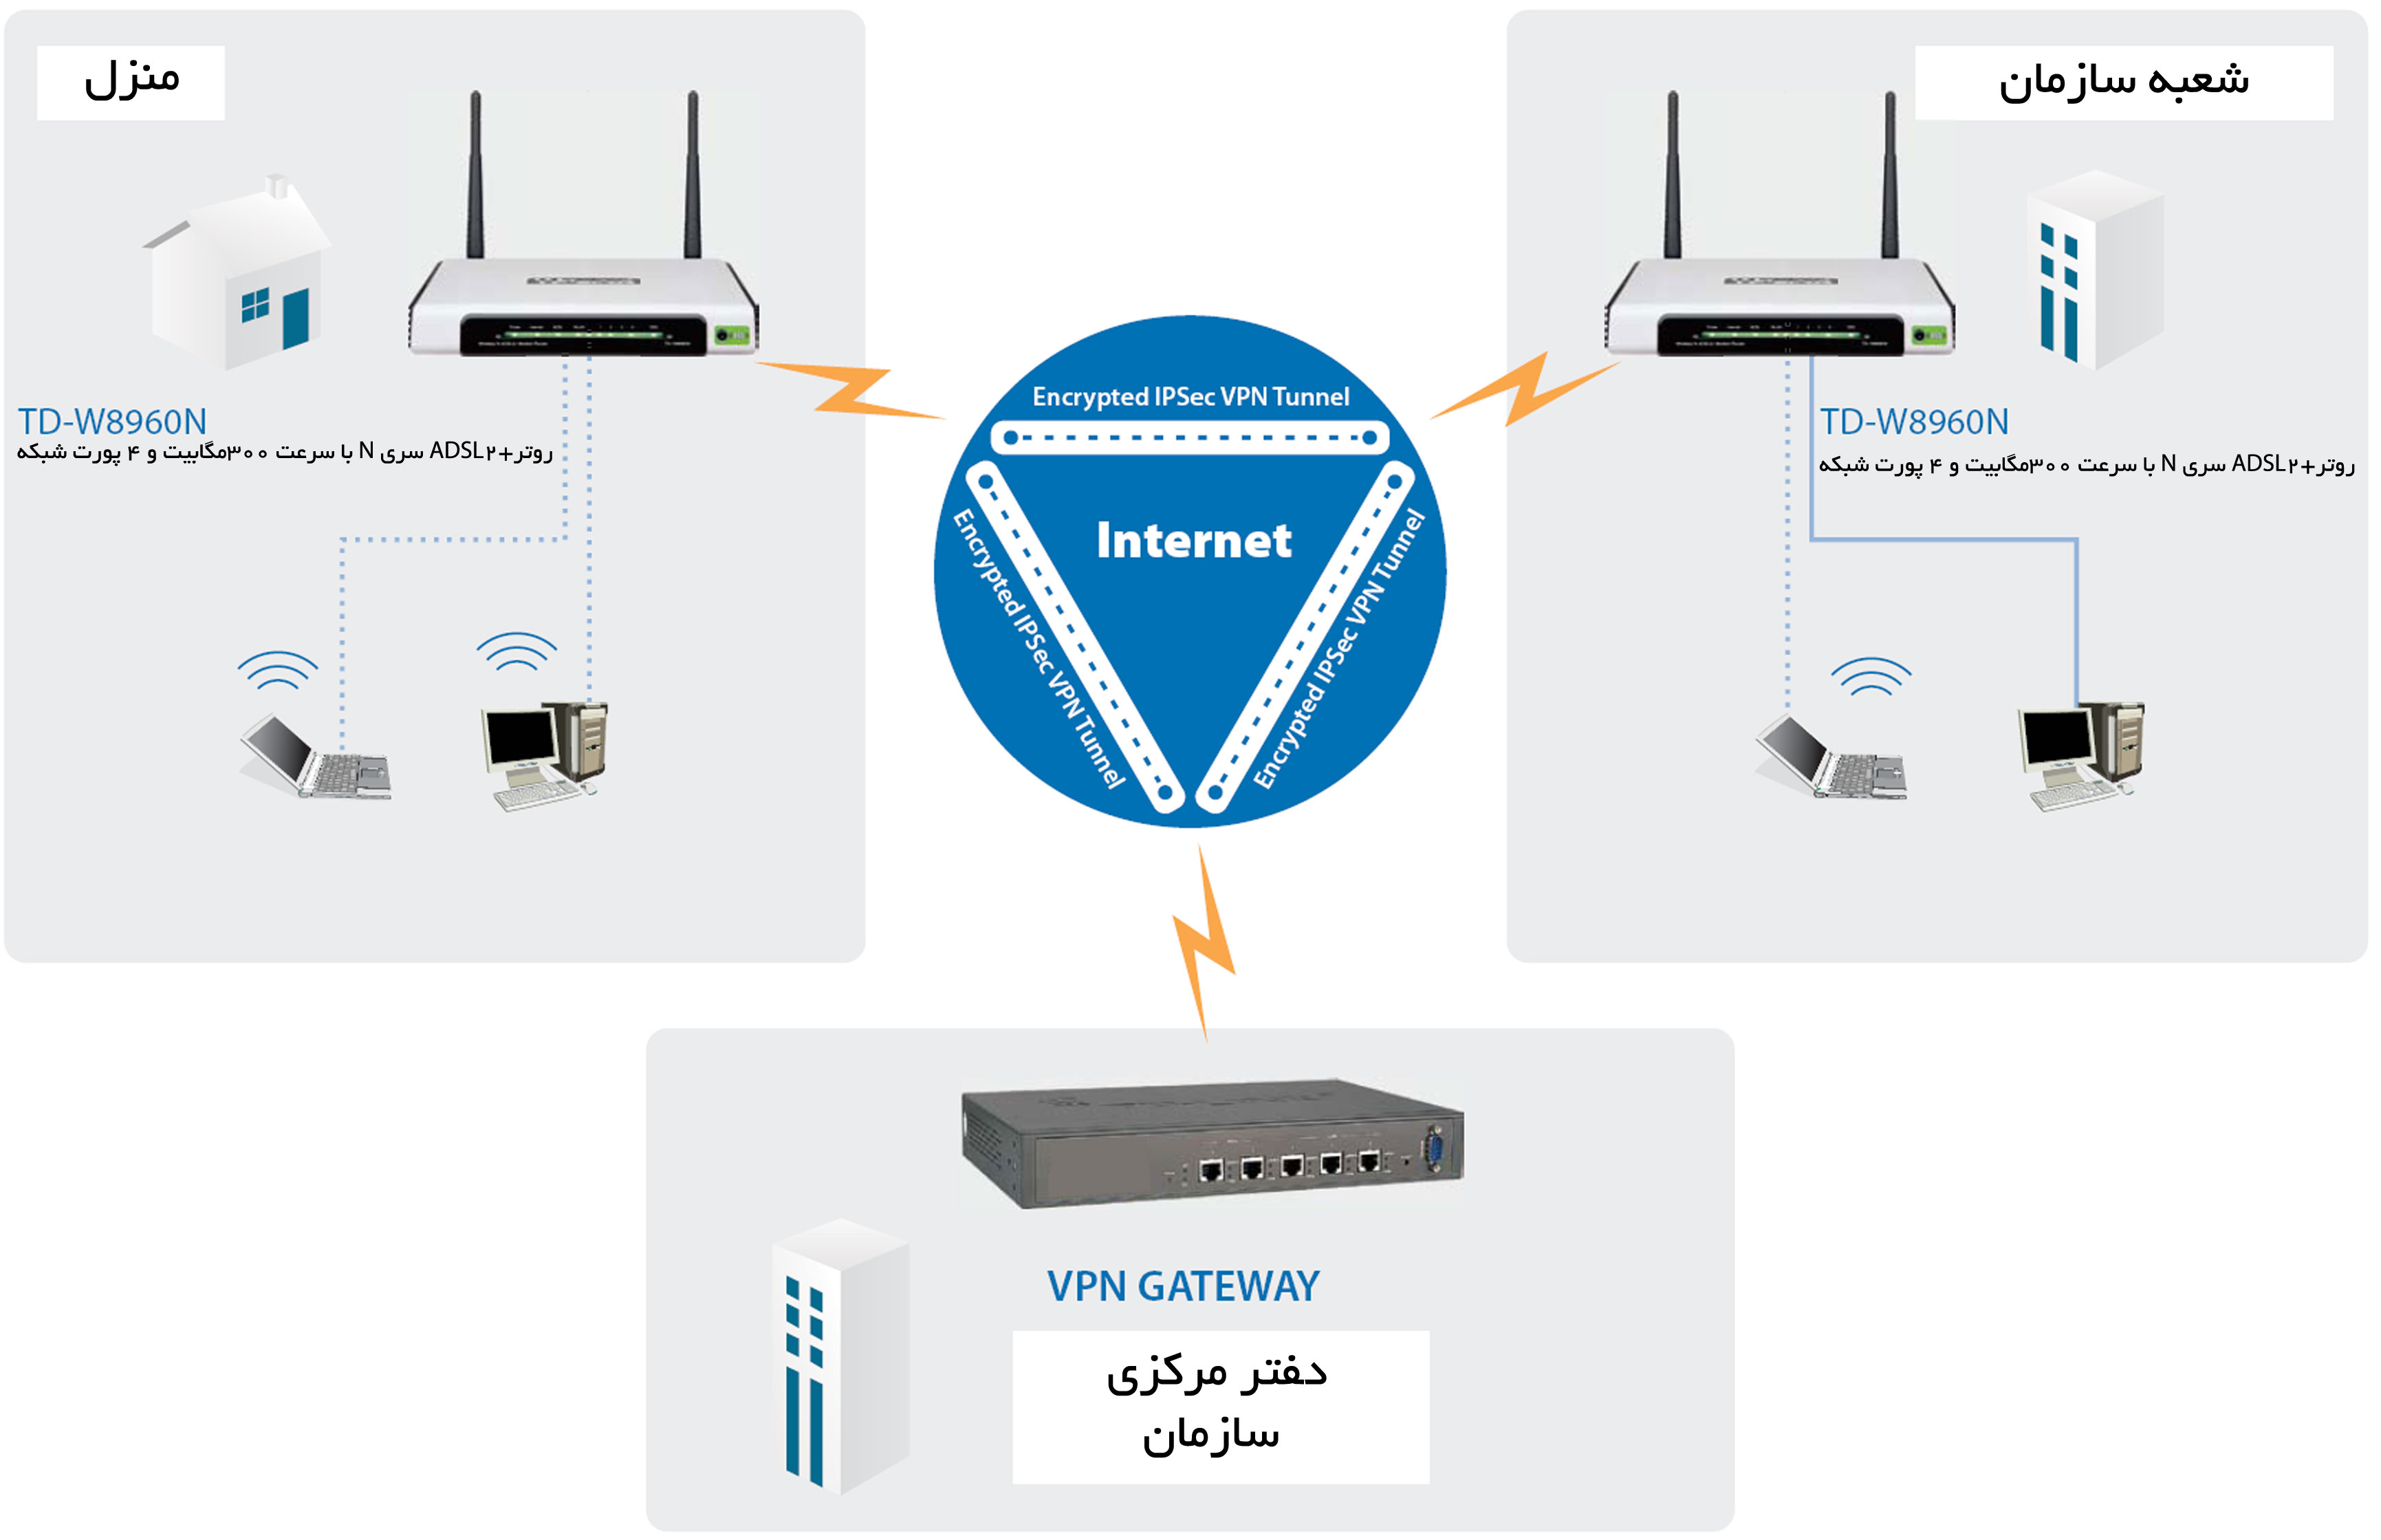 LED Indicators. Hardware Specification. BROADCOM. Wireless Chipset